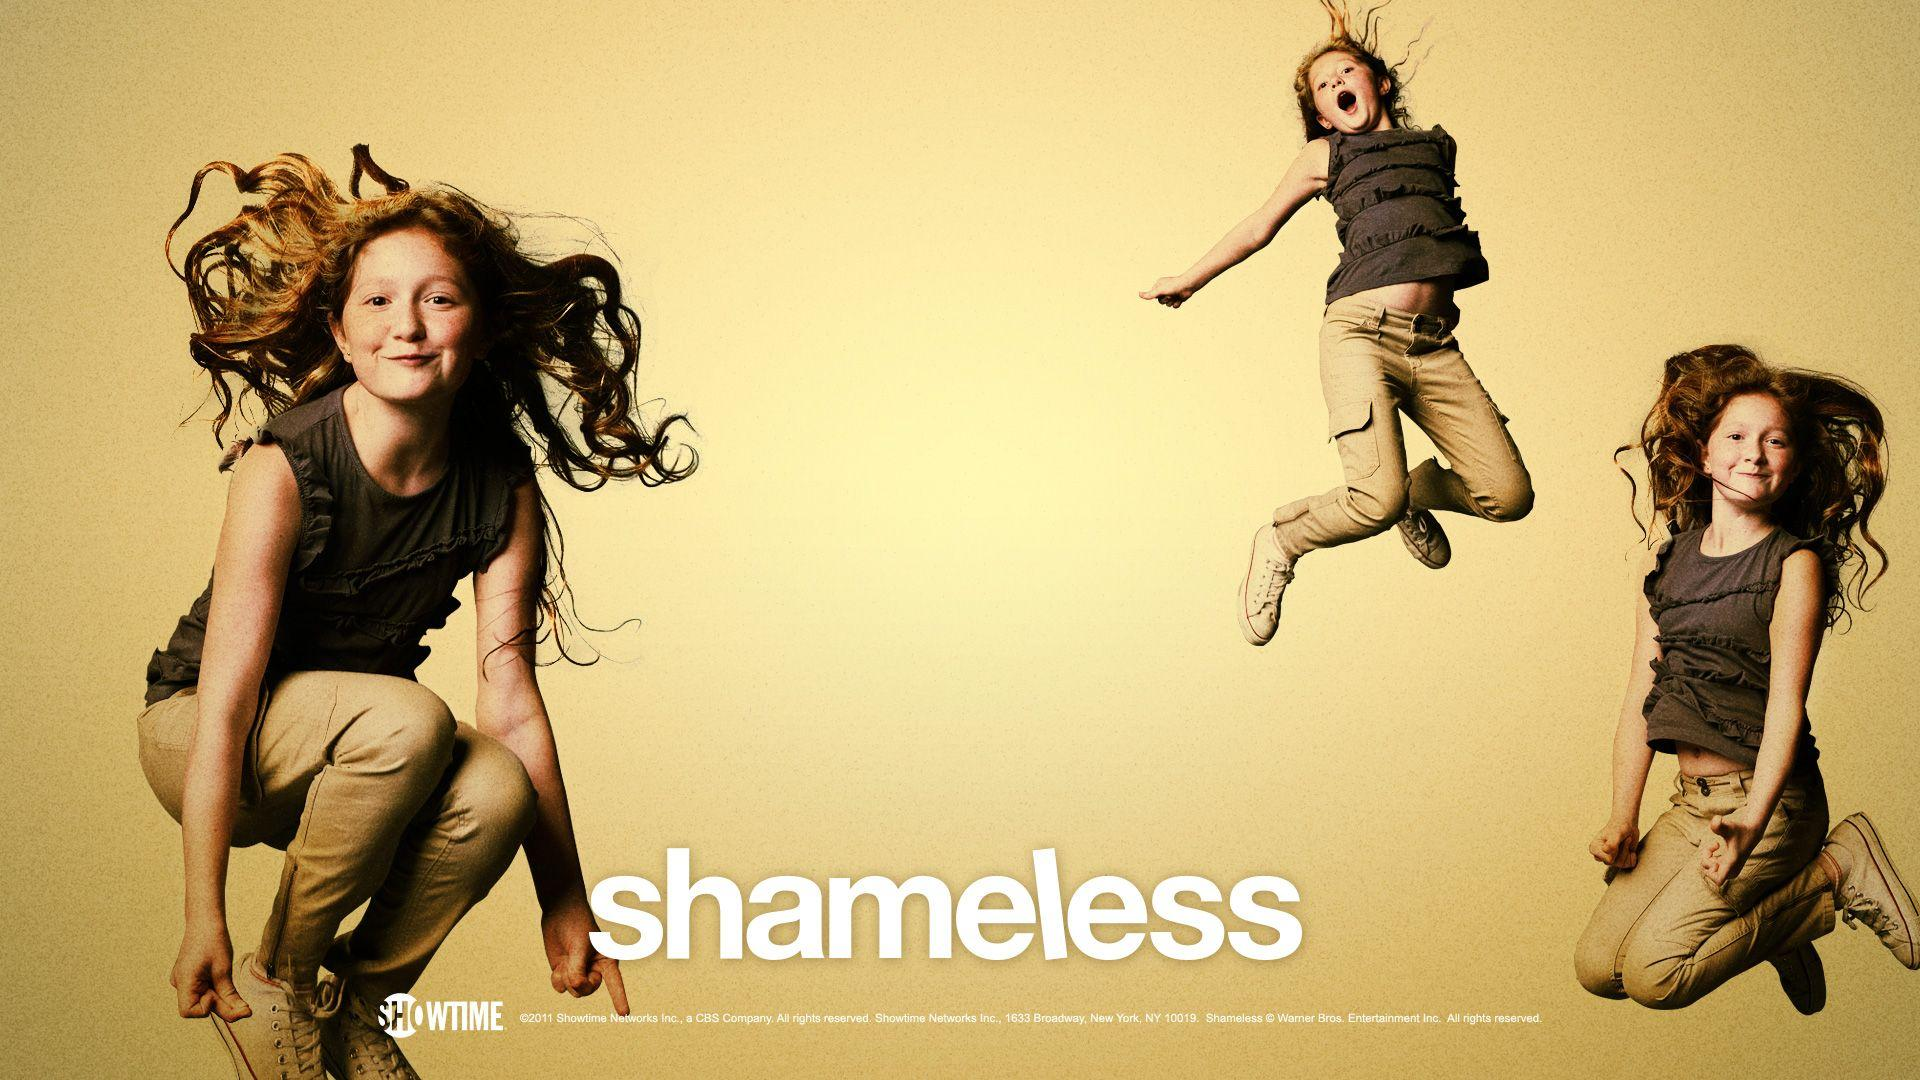 Shameless #389250 | Full HD Widescreen wallpapers for desktop download